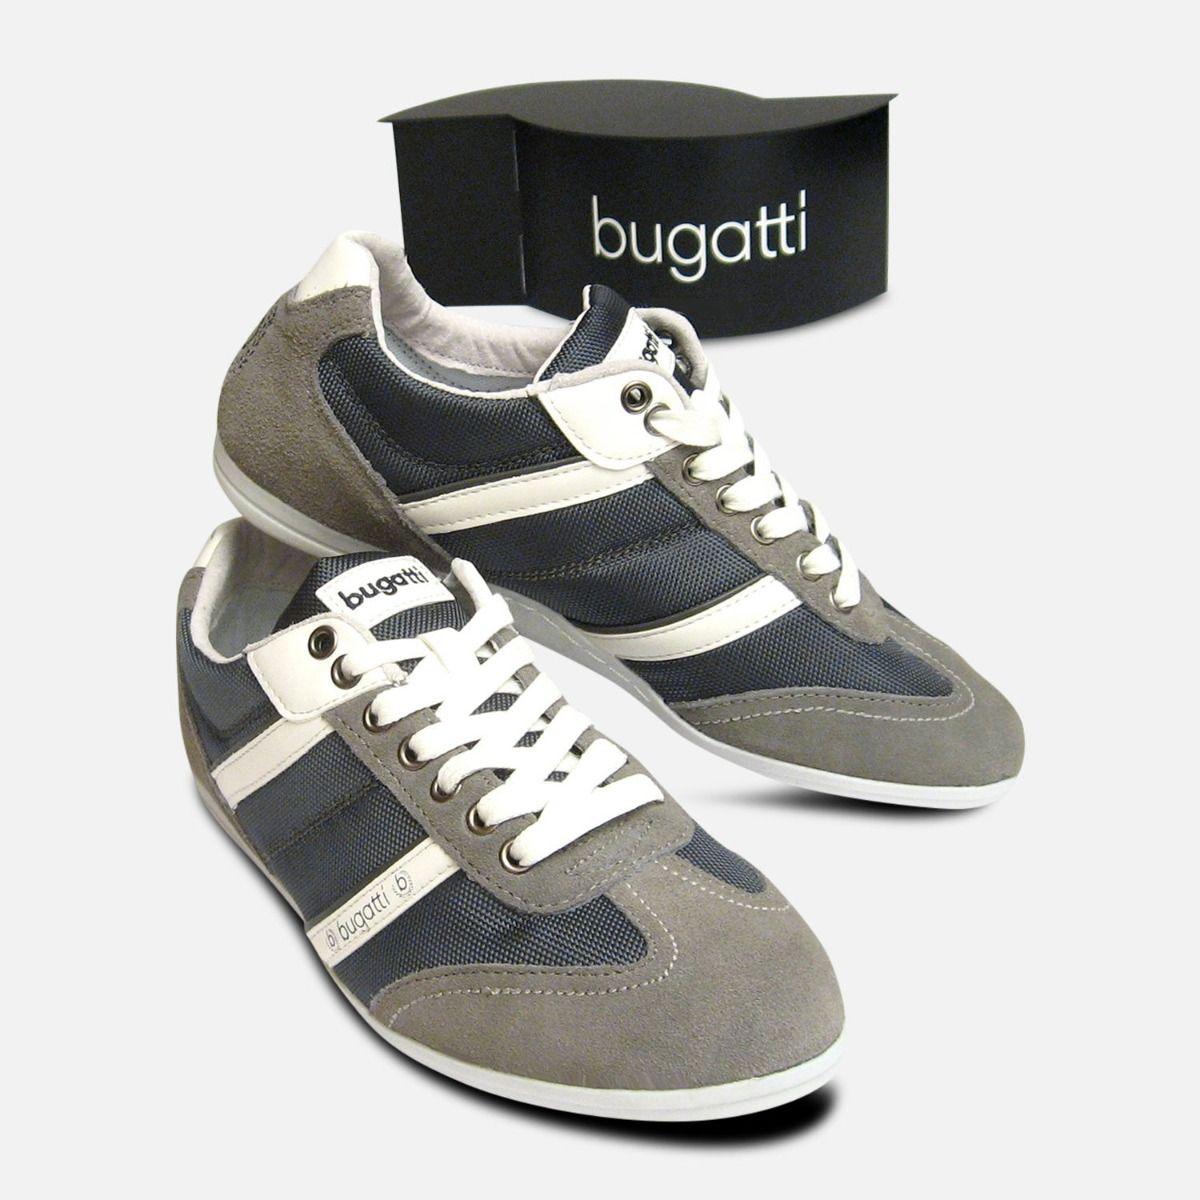 faa50bf2fcd3 Mens Bugatti Sneakers in Grey Suede Leather Designer Trainers